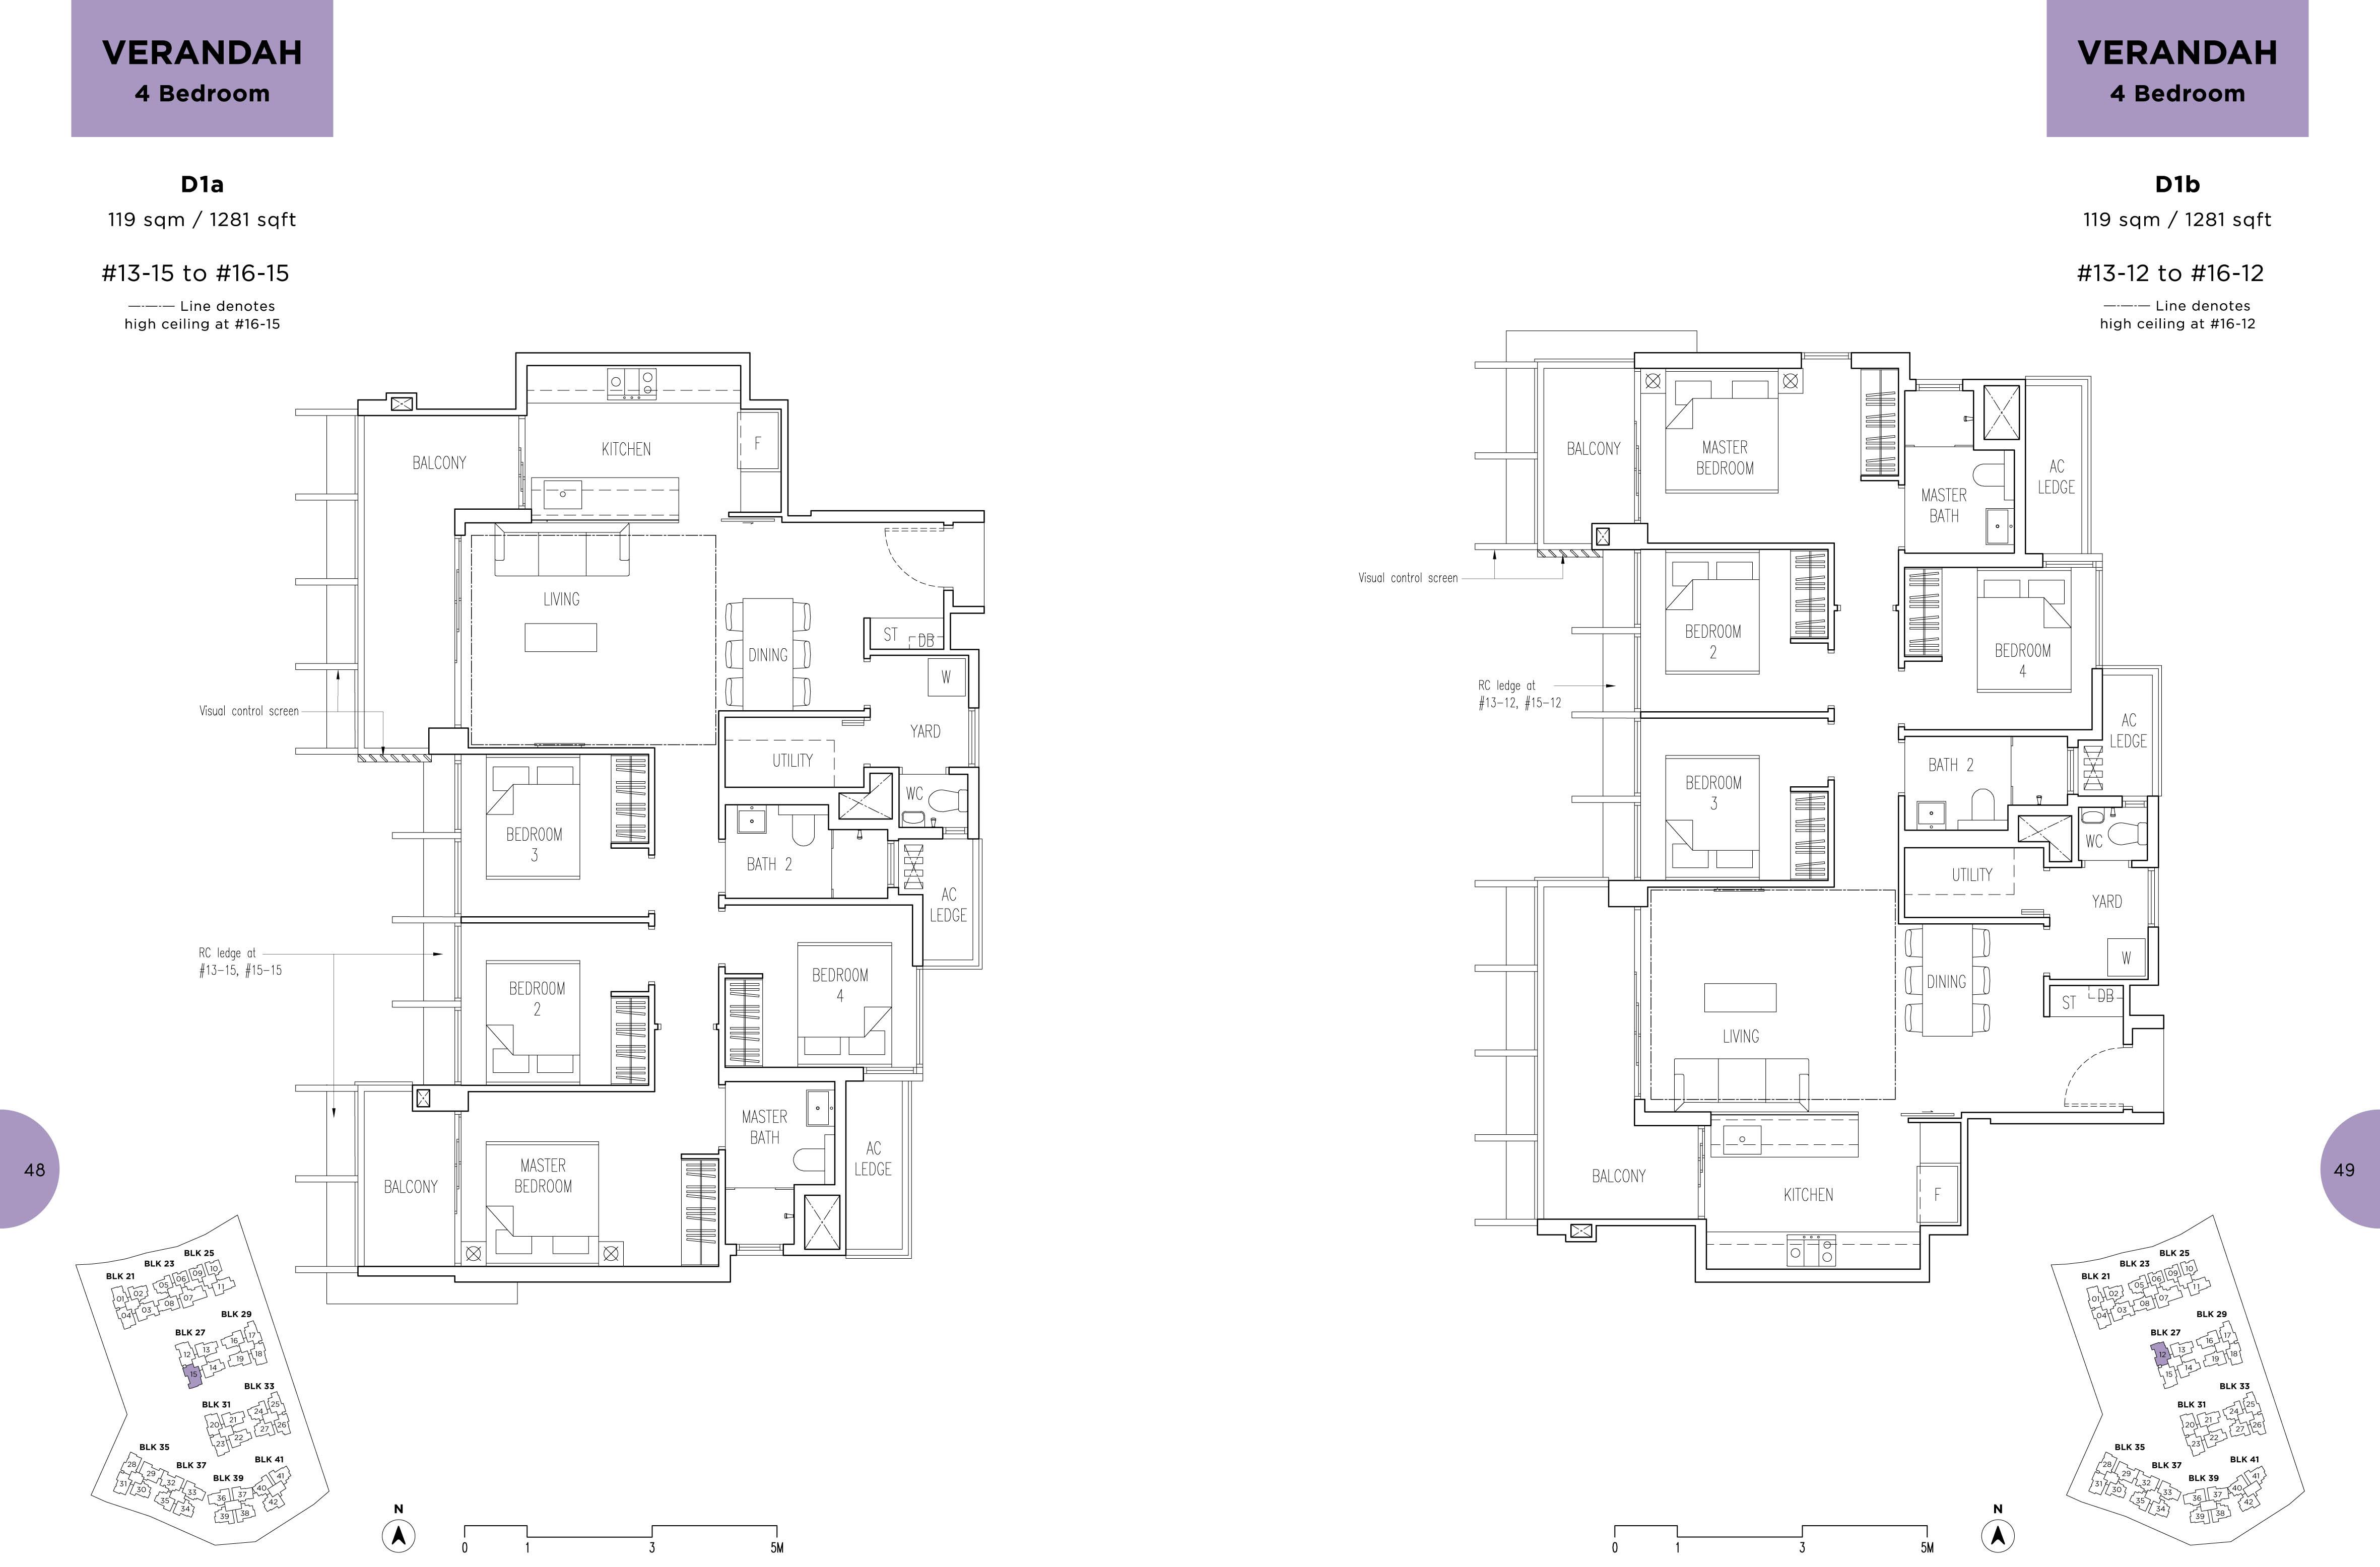 verandah_Floorplan-9